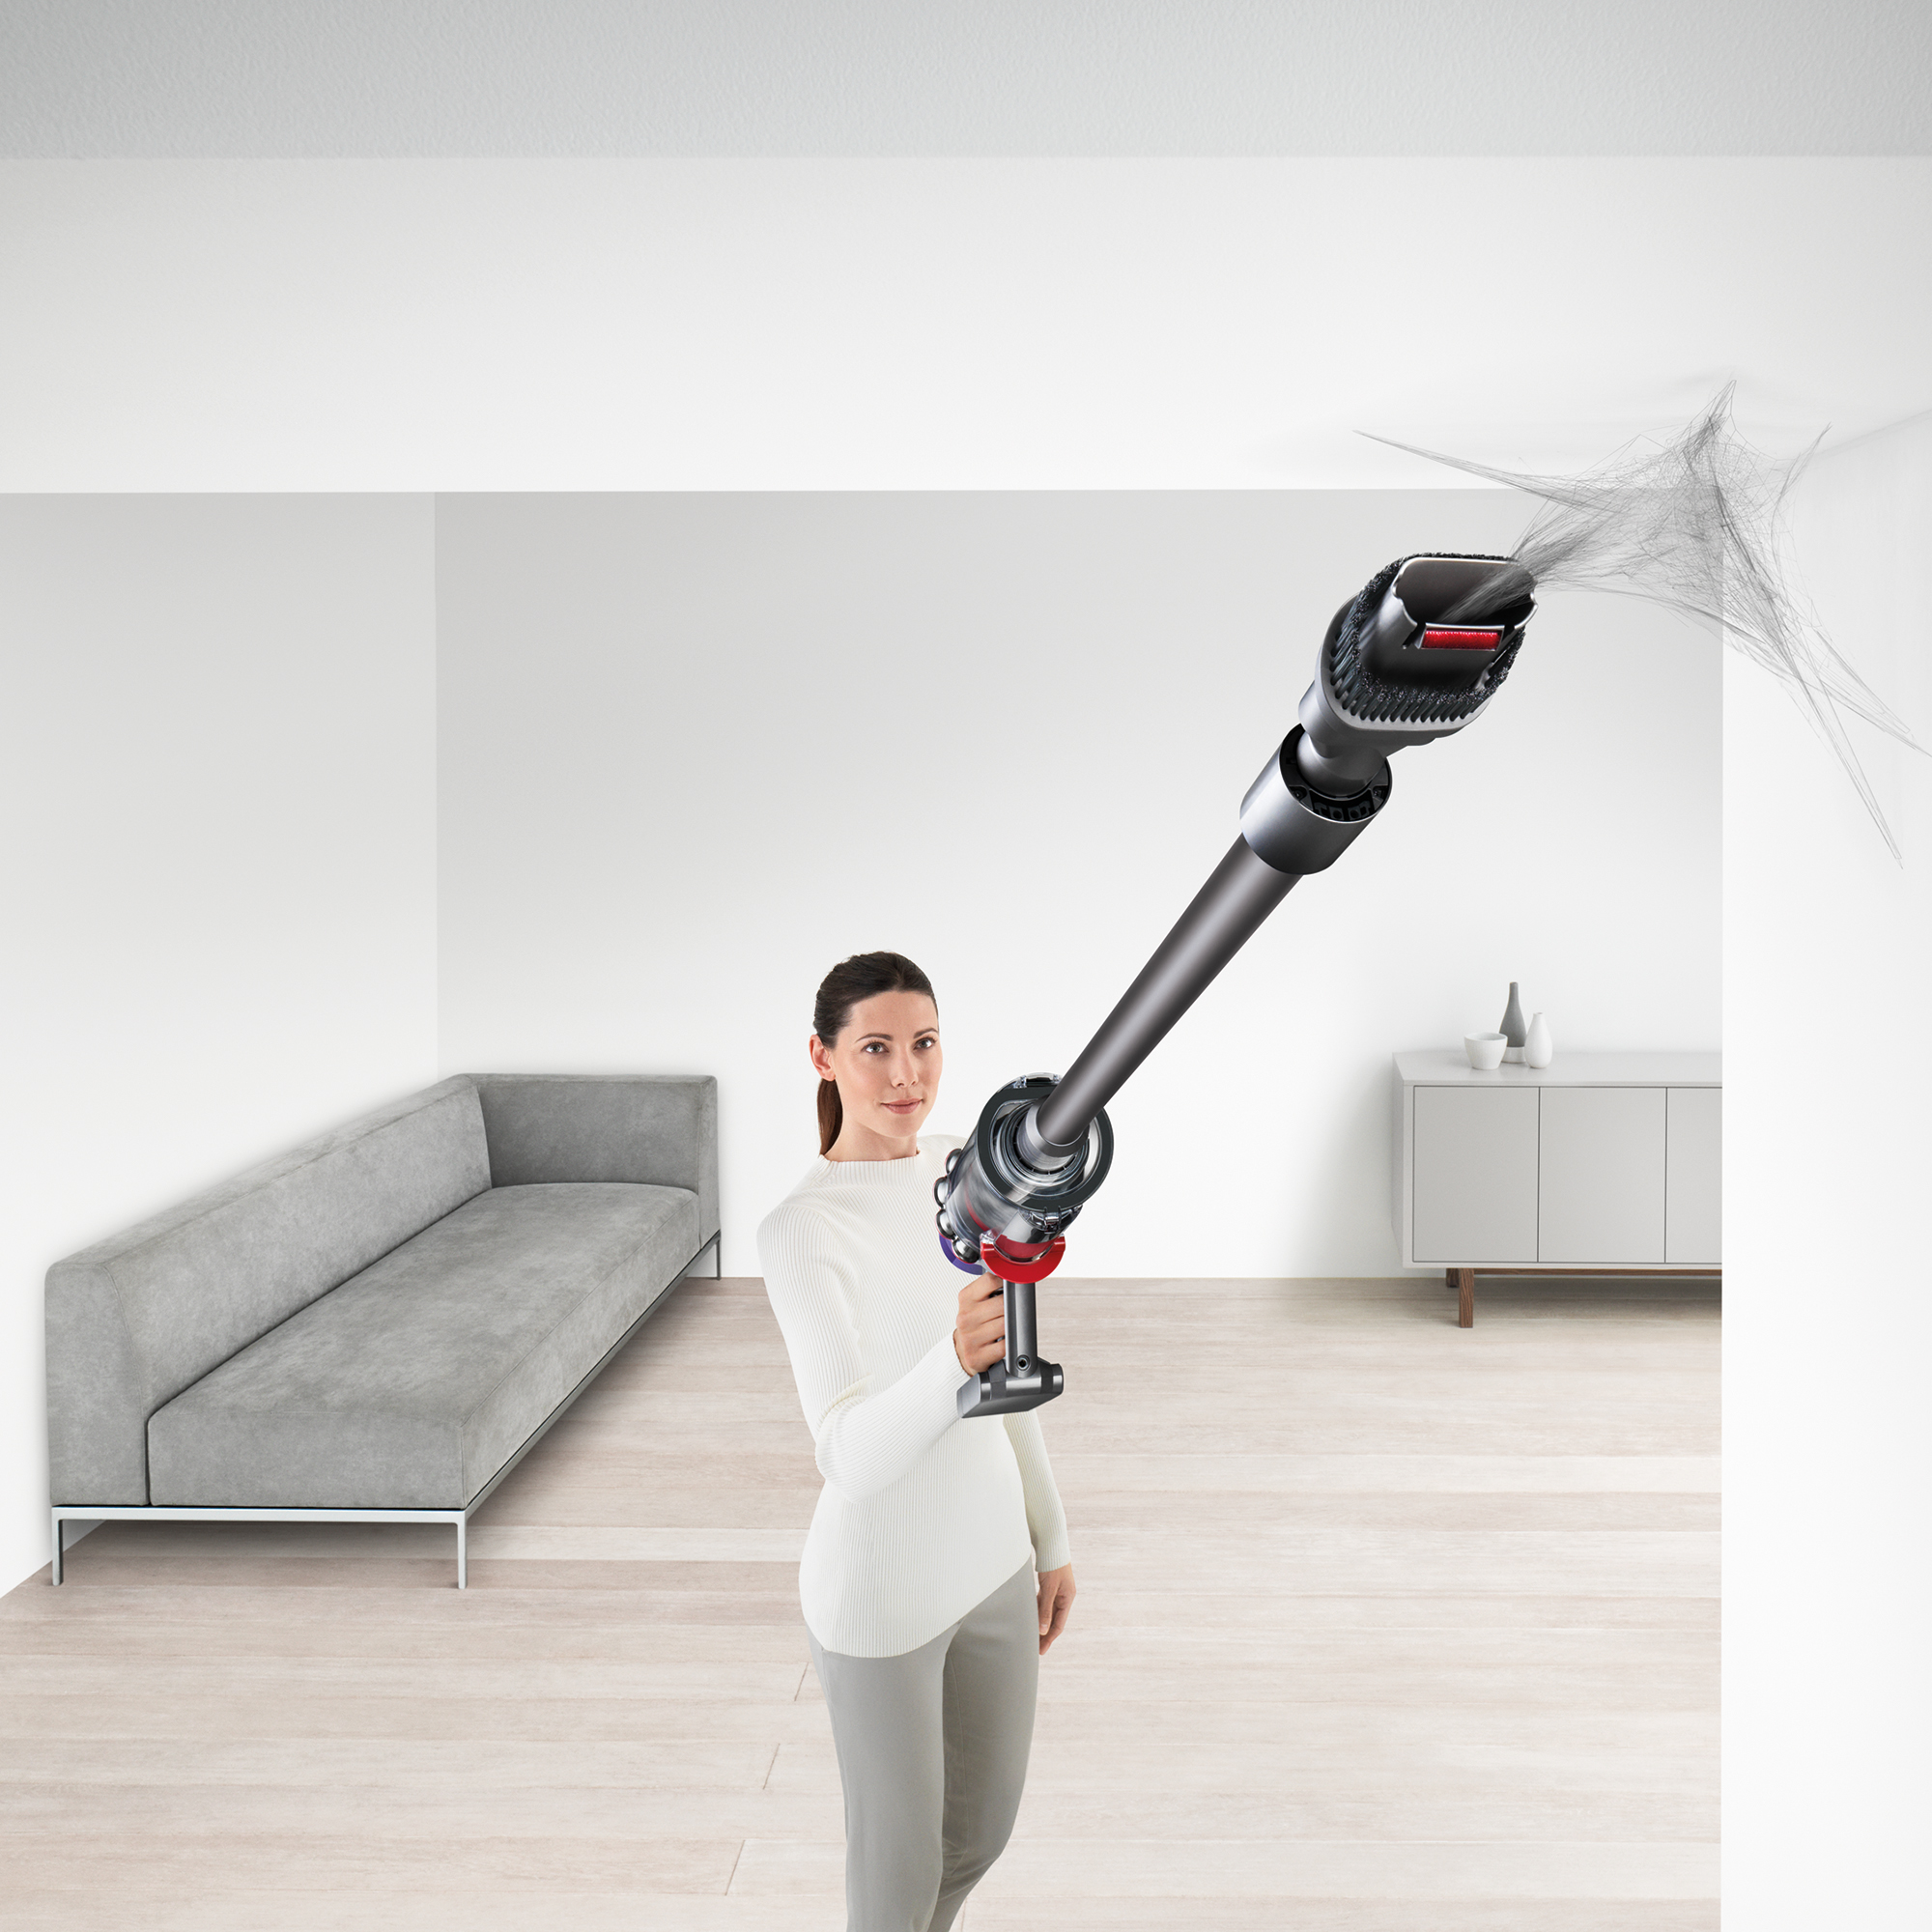 Dyson-V10-Animal-Pro-Cordless-Vacuum-Cleaner-Refurbished thumbnail 21